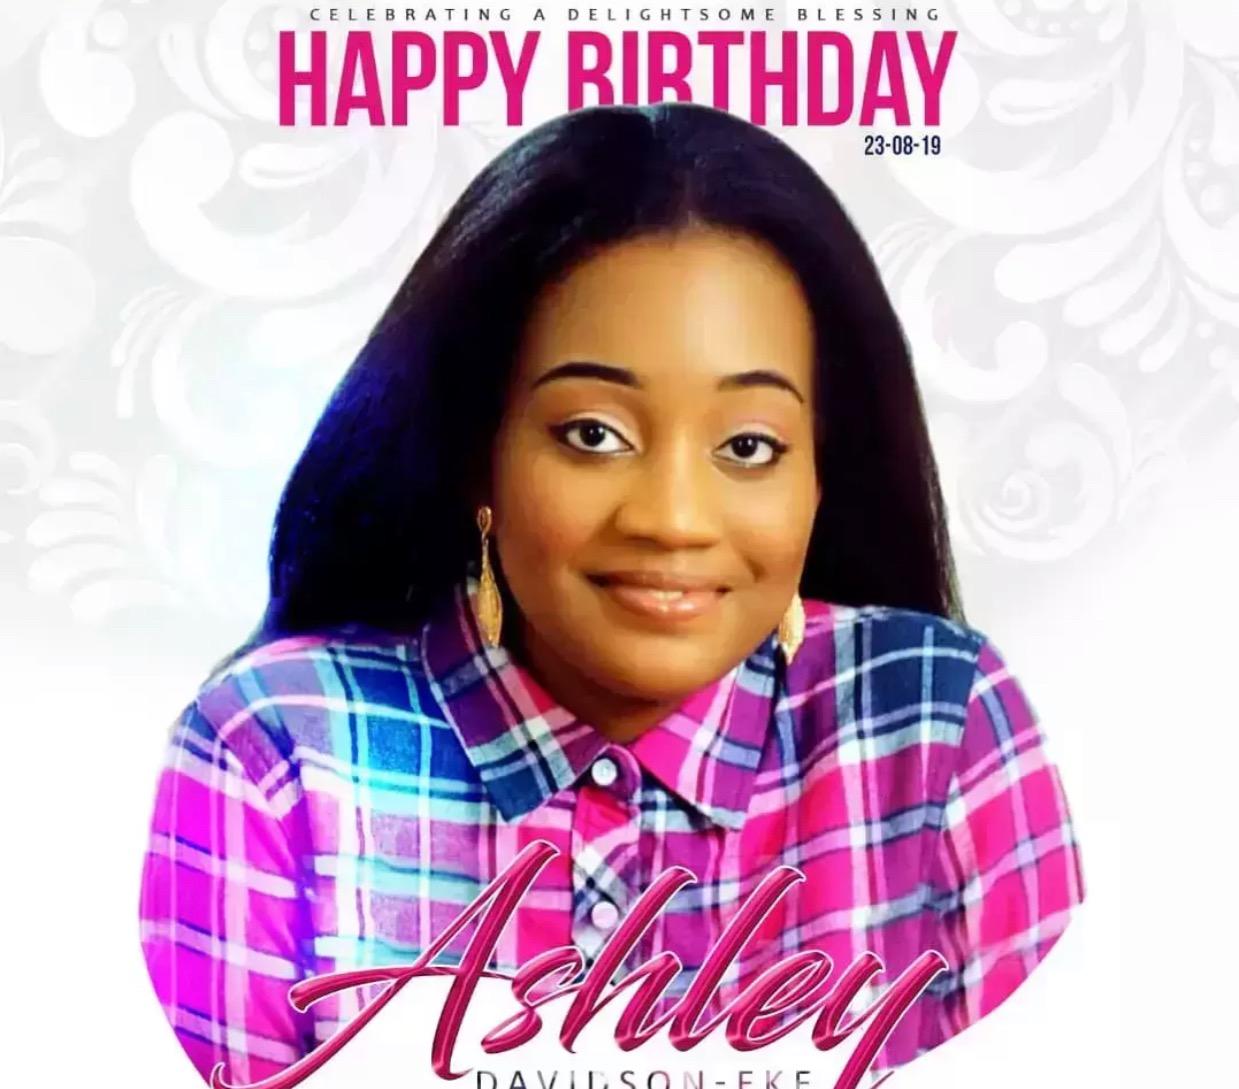 Happy Birthday Sweet Ashley! Your